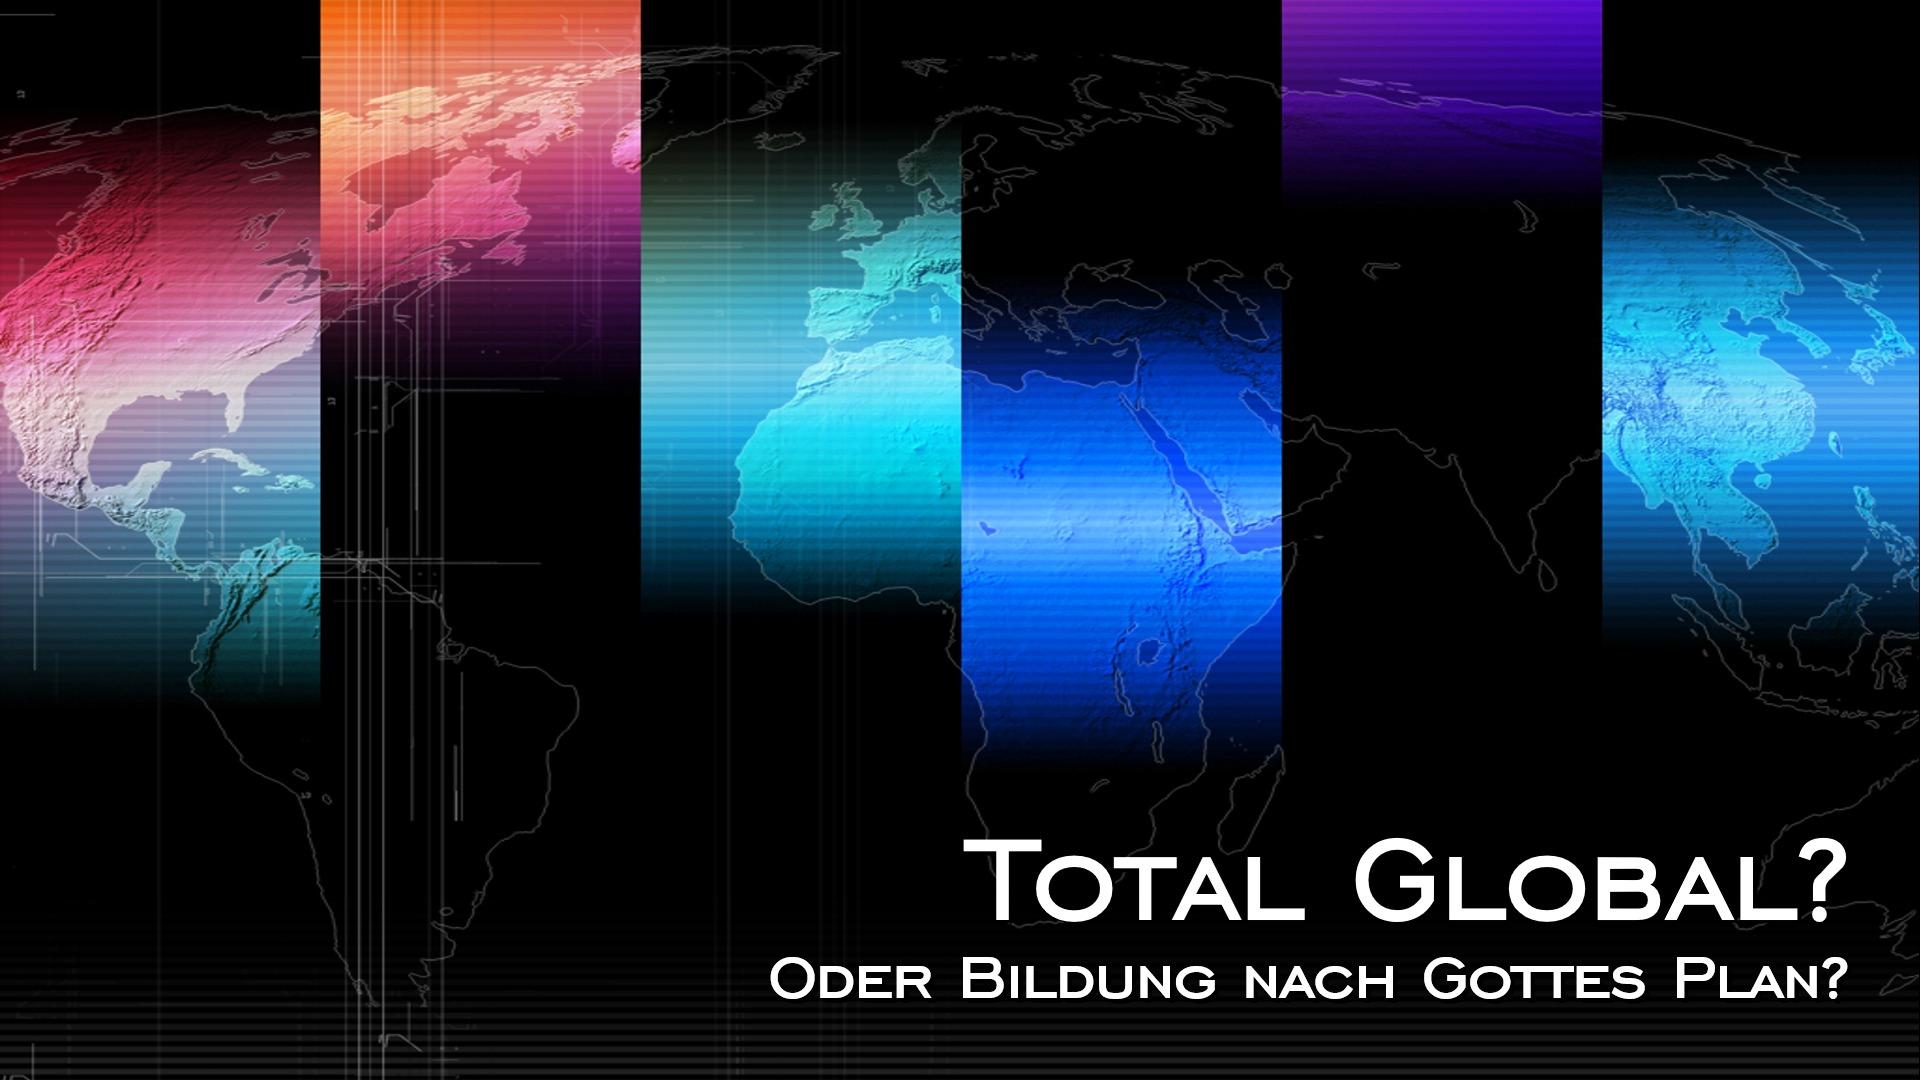 Total global? Oder Bildung nach Gottes Plan? (TGGP 1)